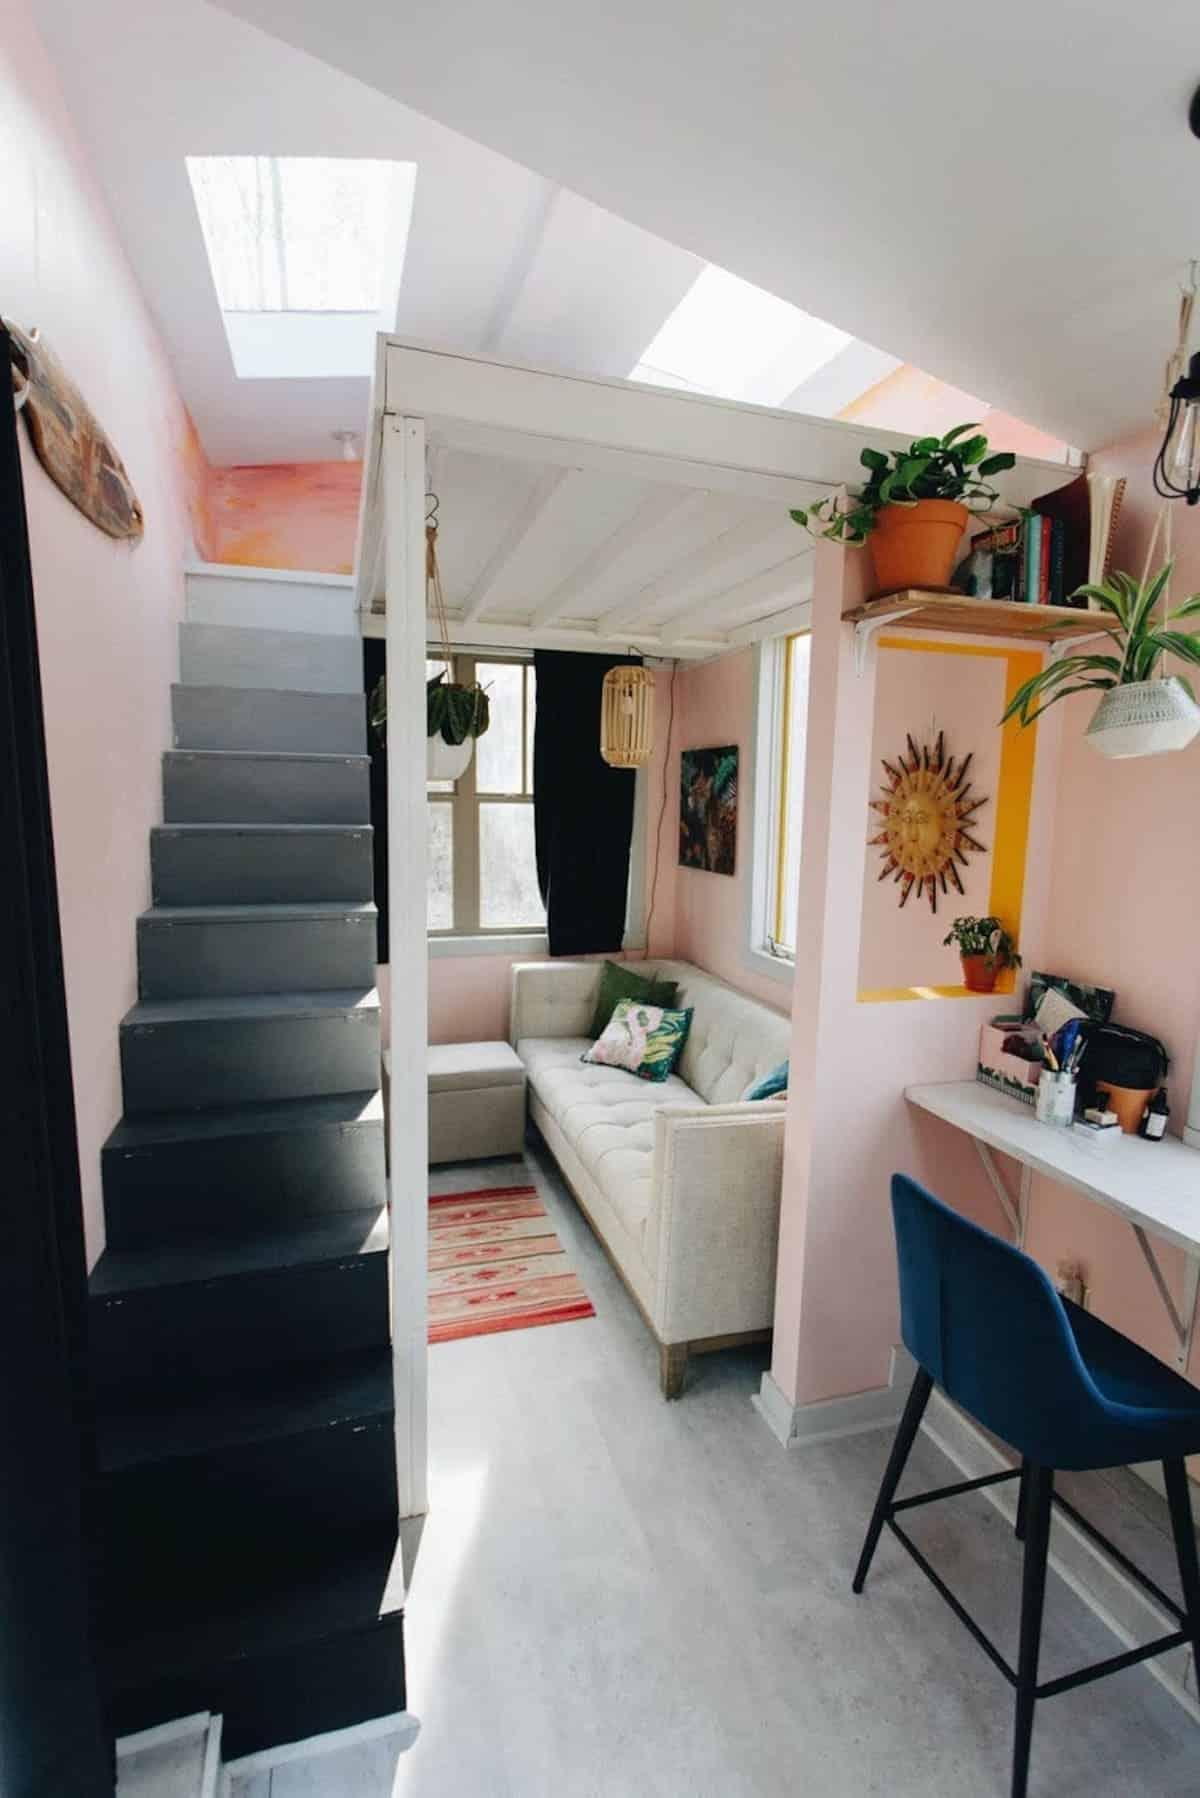 tiny house hola 10 - Tropical tiny house offers visitors a creative getaway